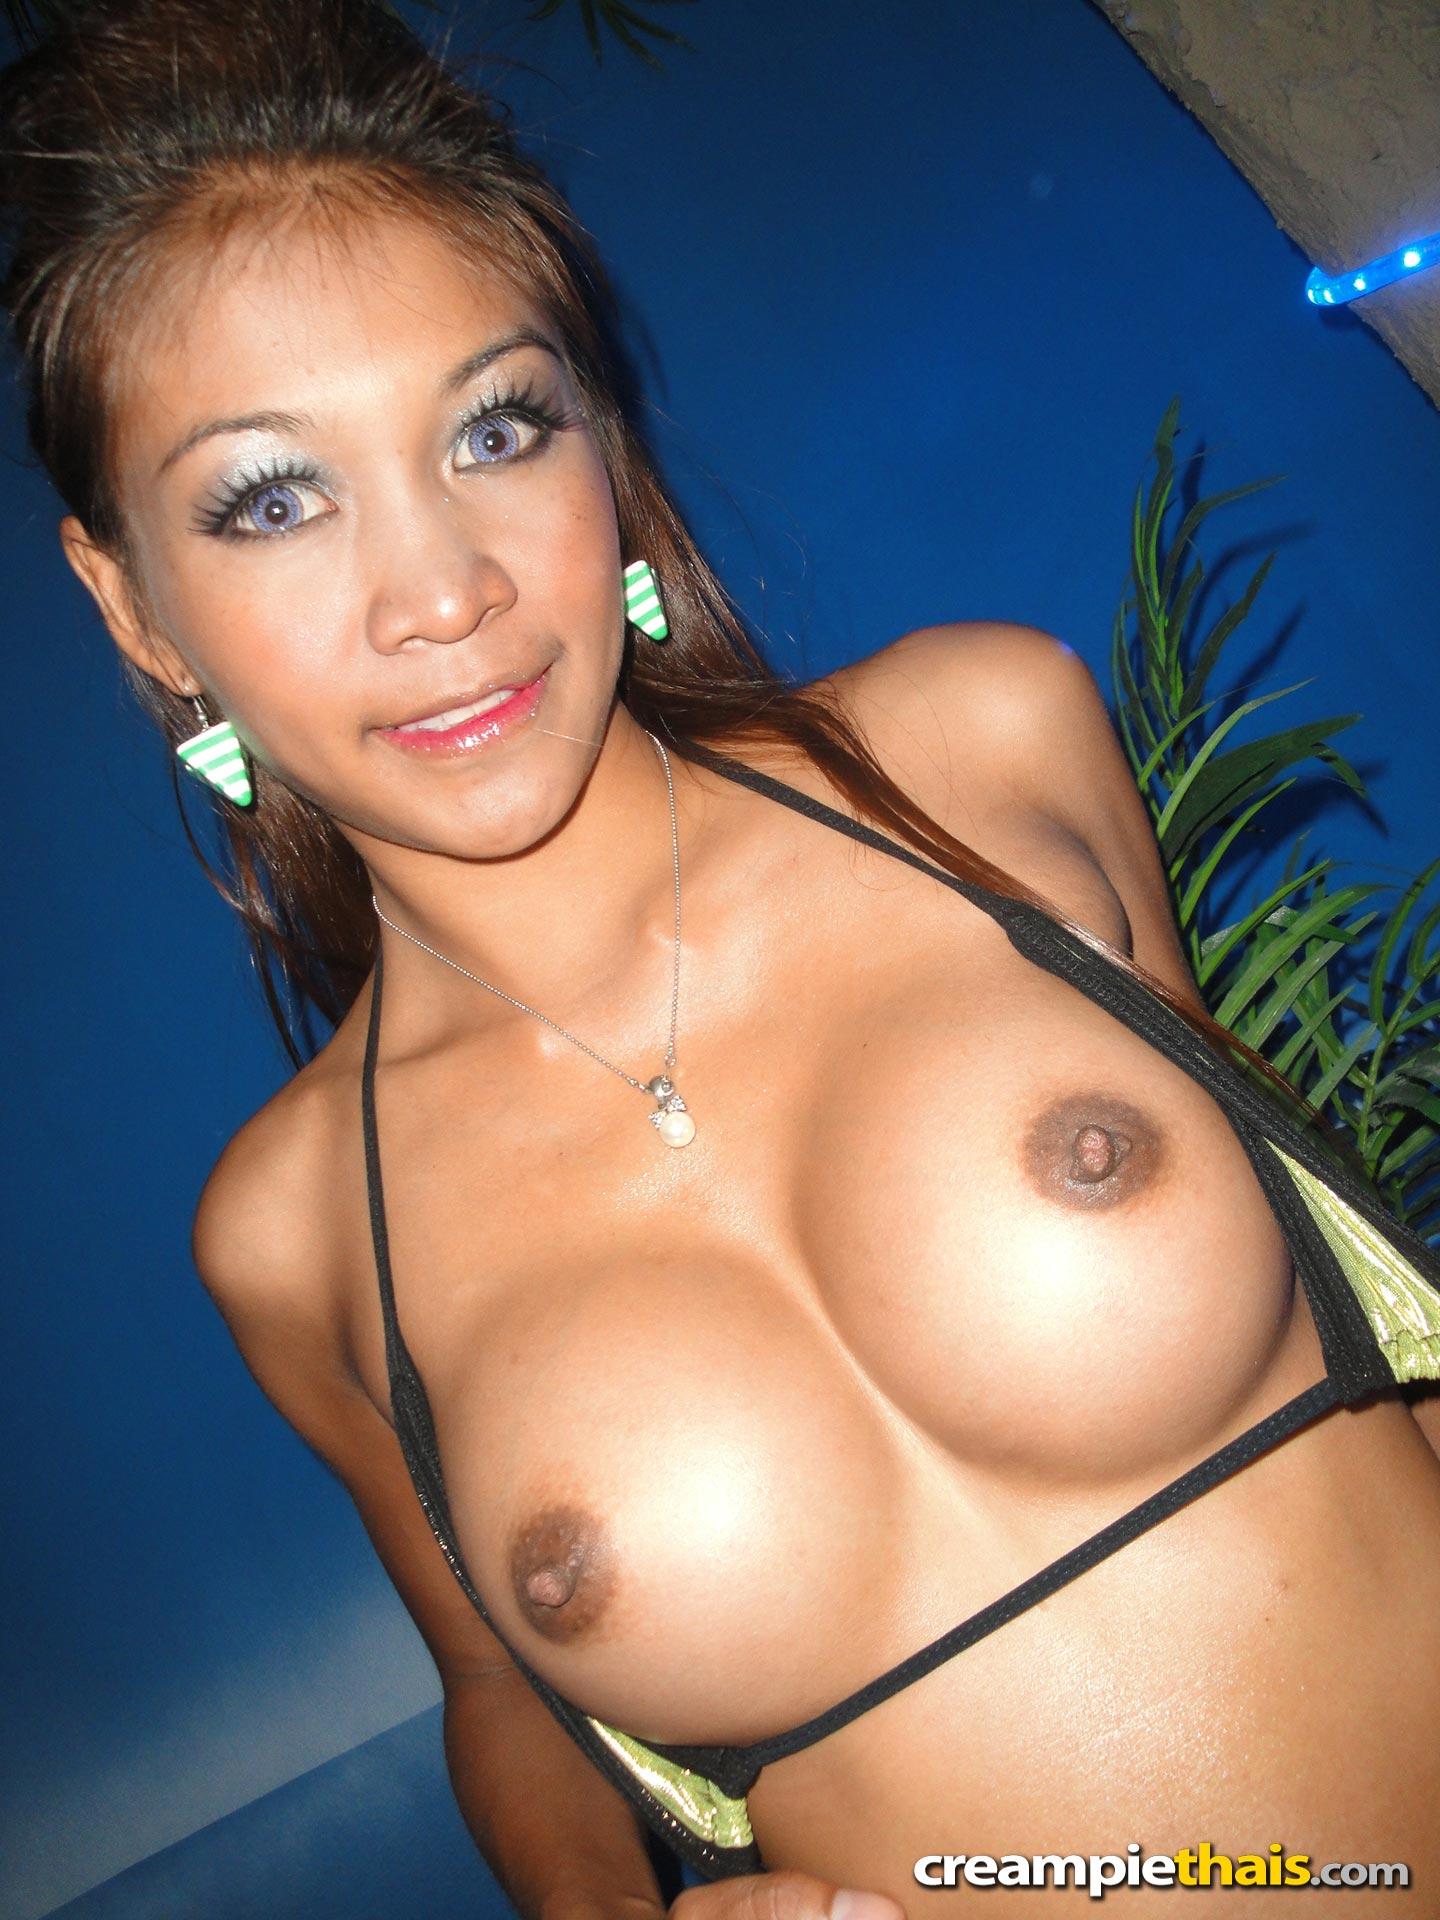 Skinny thai porn